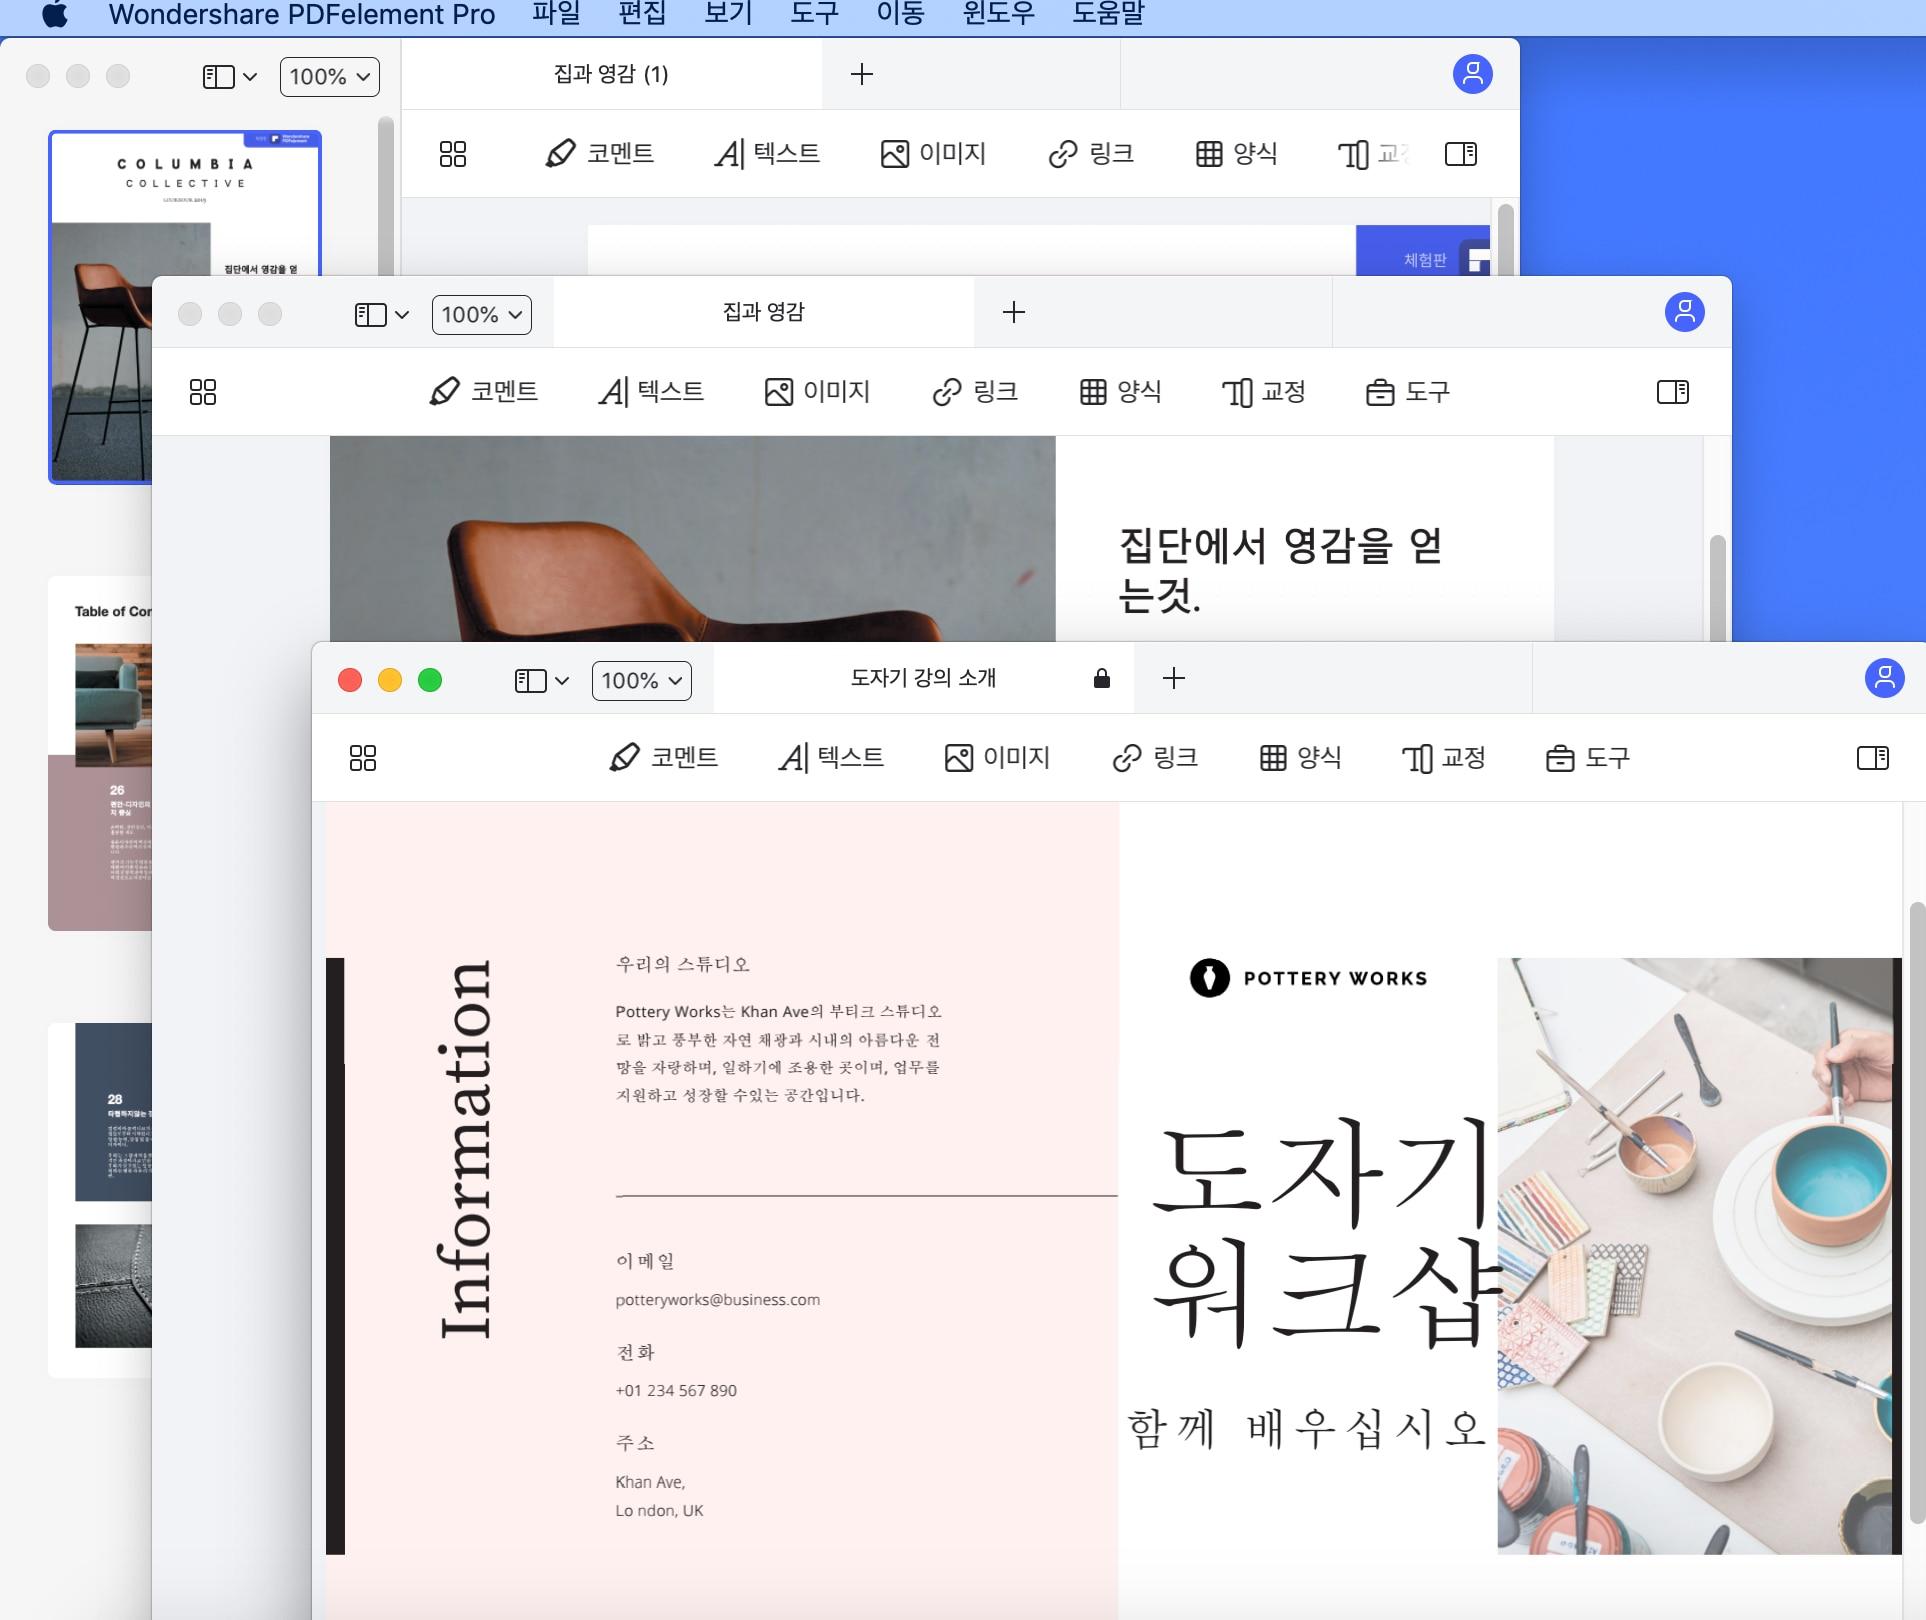 multi tab viewing